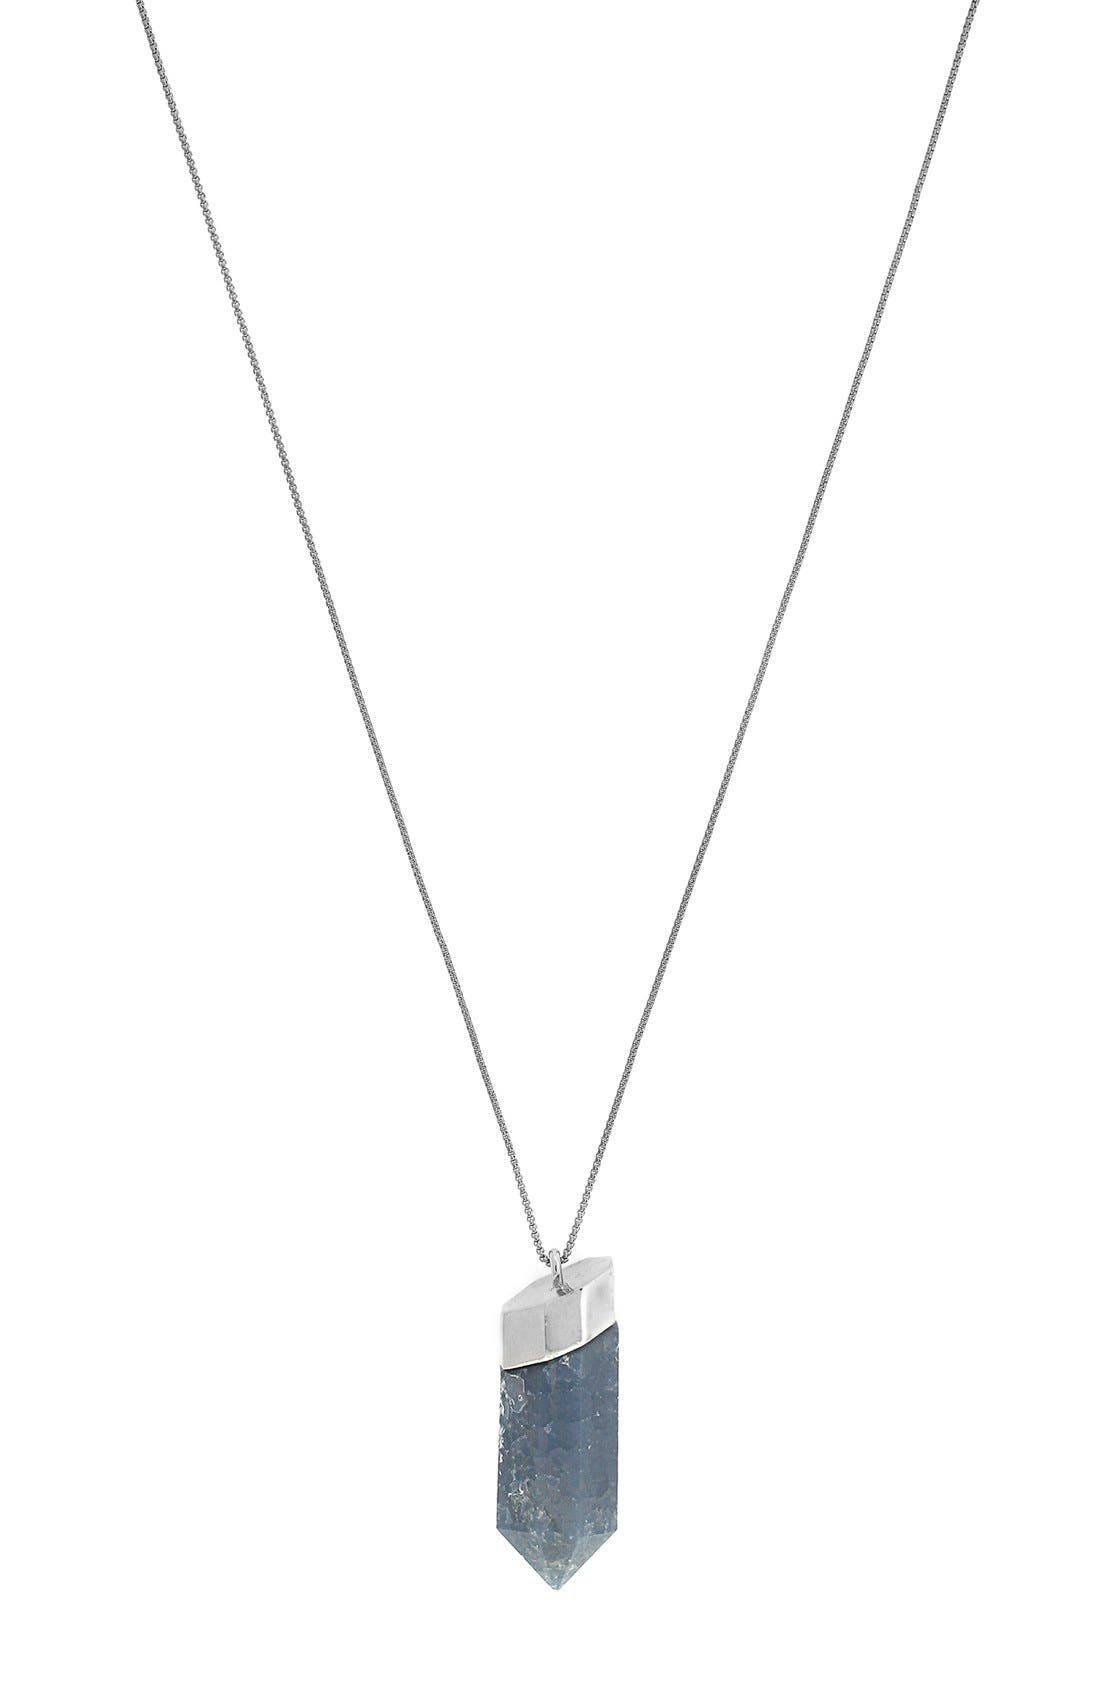 Main Image - Vince Camuto 'Shard' Pendant Necklace